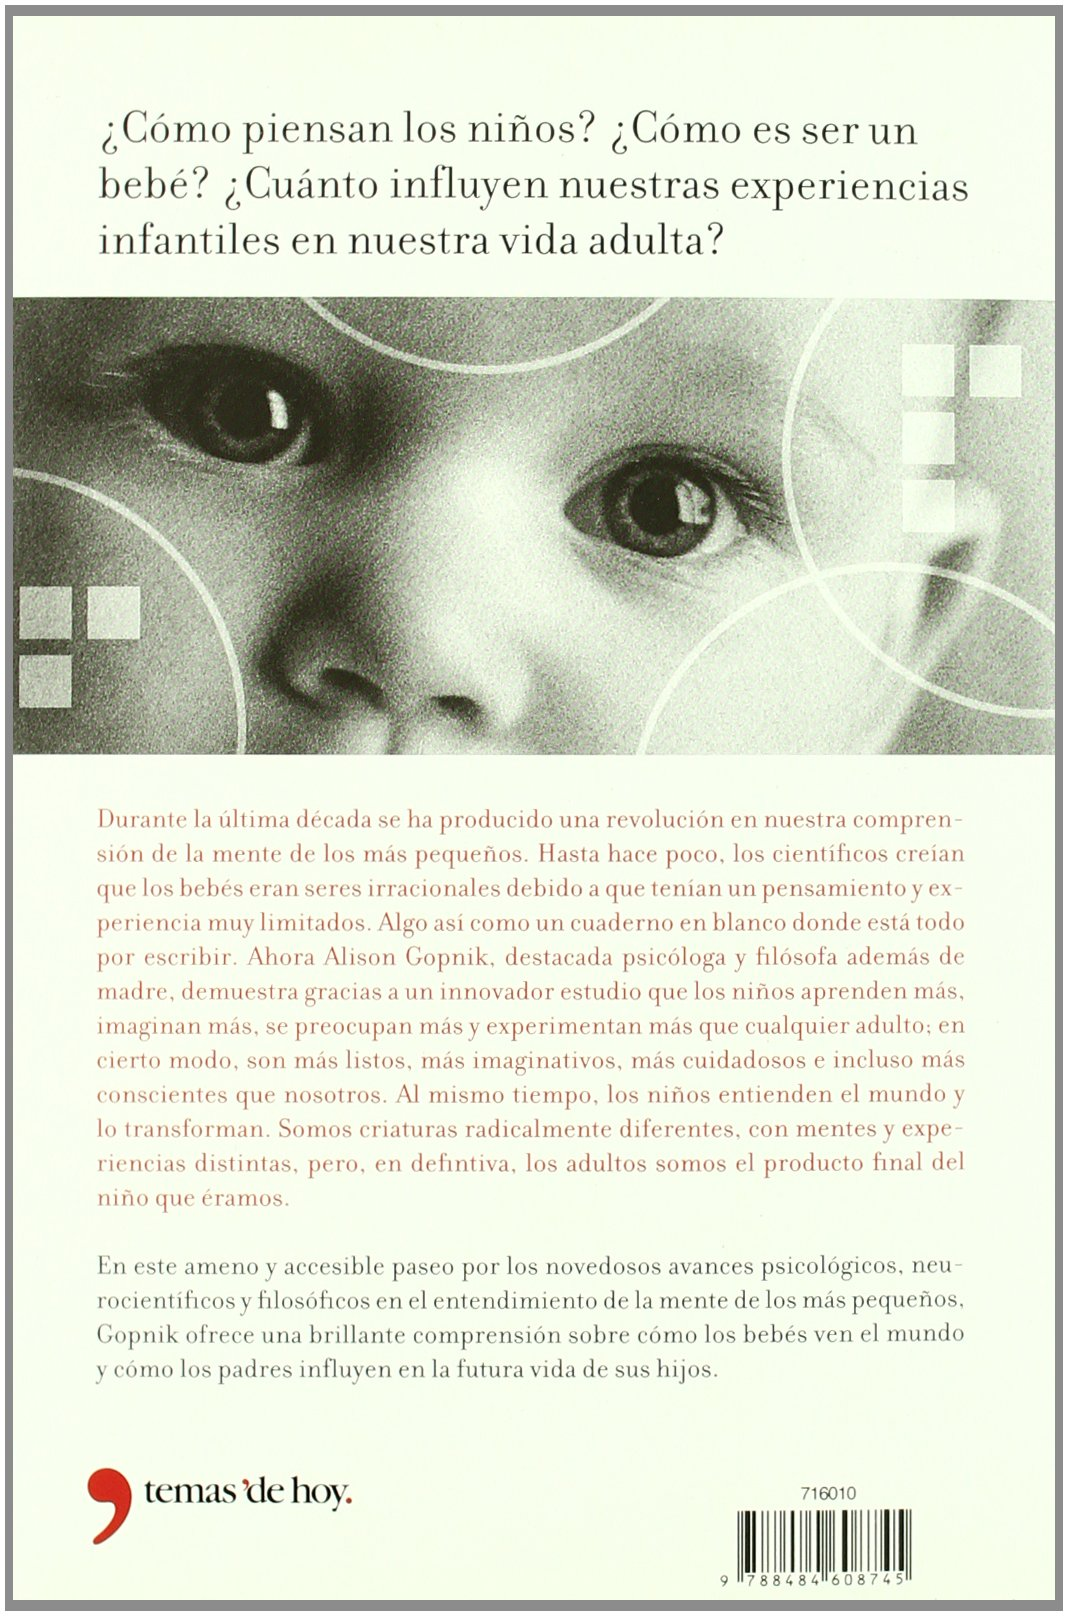 El filósofo entre pañales: ALISON GOPNIK: 9788484608745: Amazon.com: Books